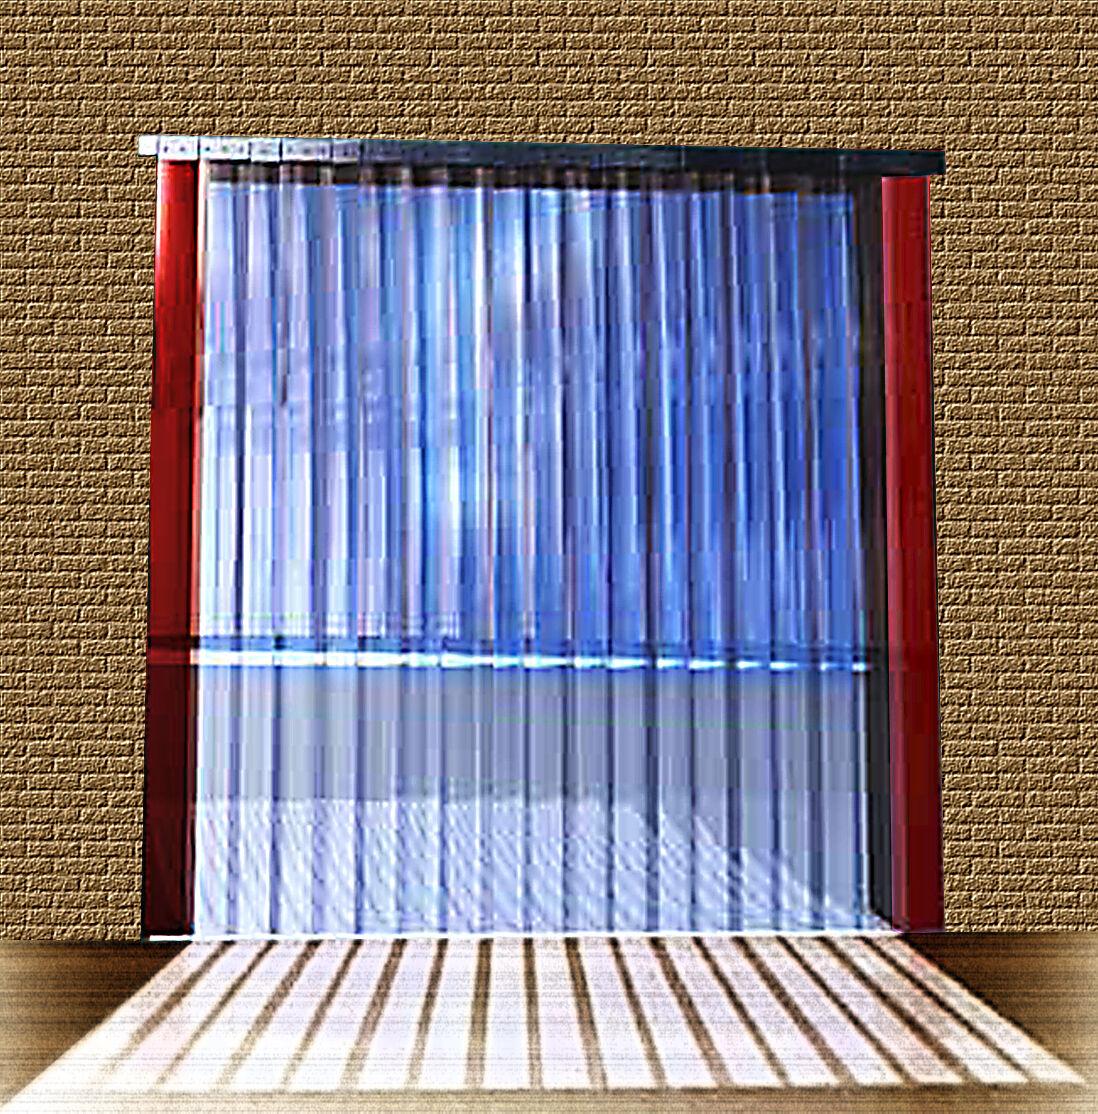 B 3,50m x H3,00m Lamellen PVC Streifen Vorhang 300x3mm